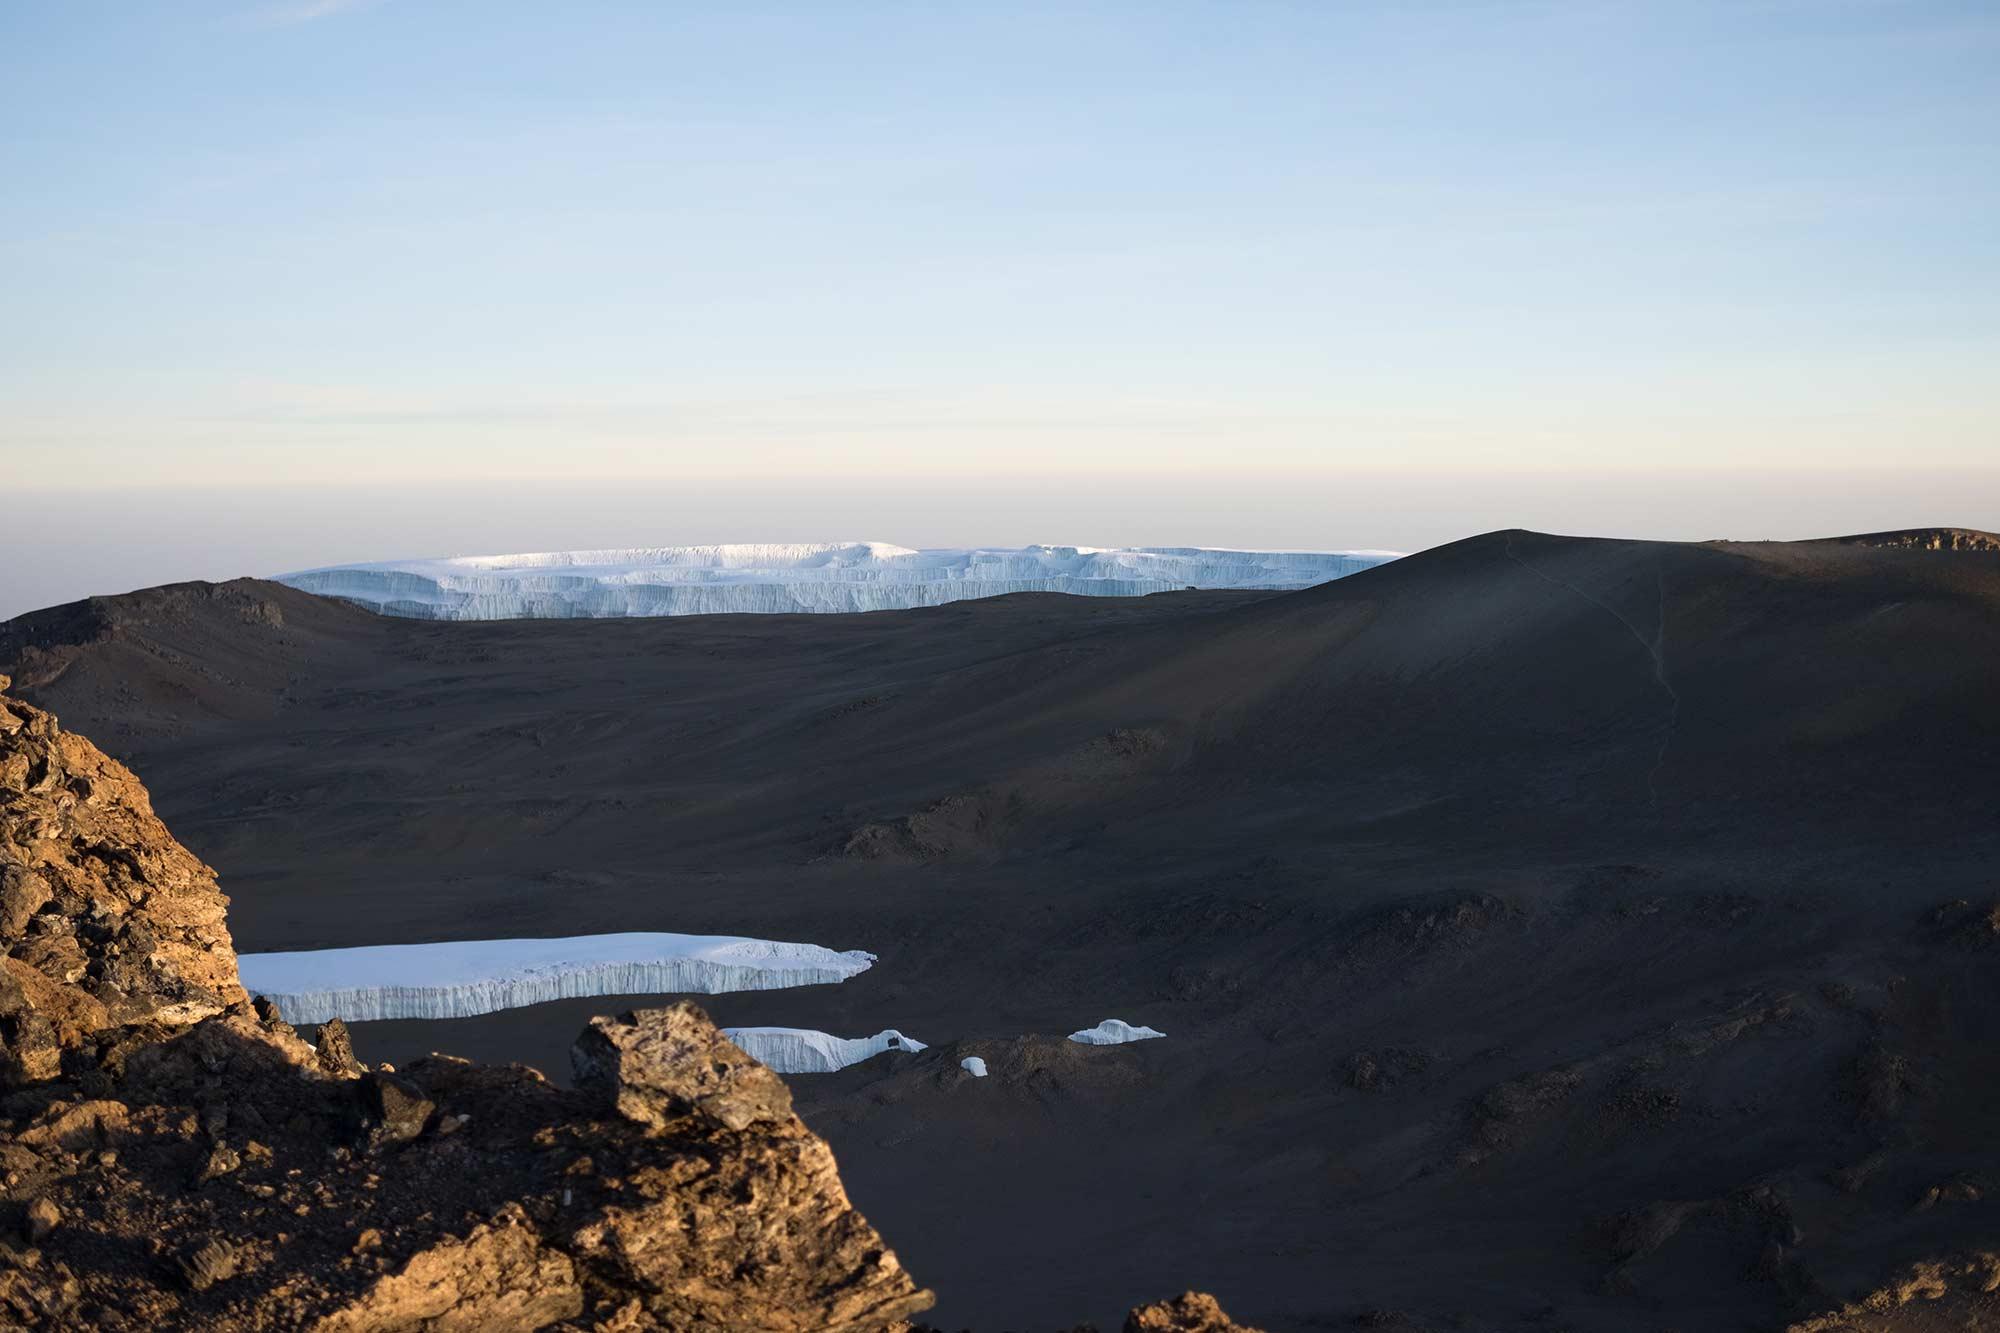 D7-27-crater-rim-left-kilimanjaro-summit.jpg